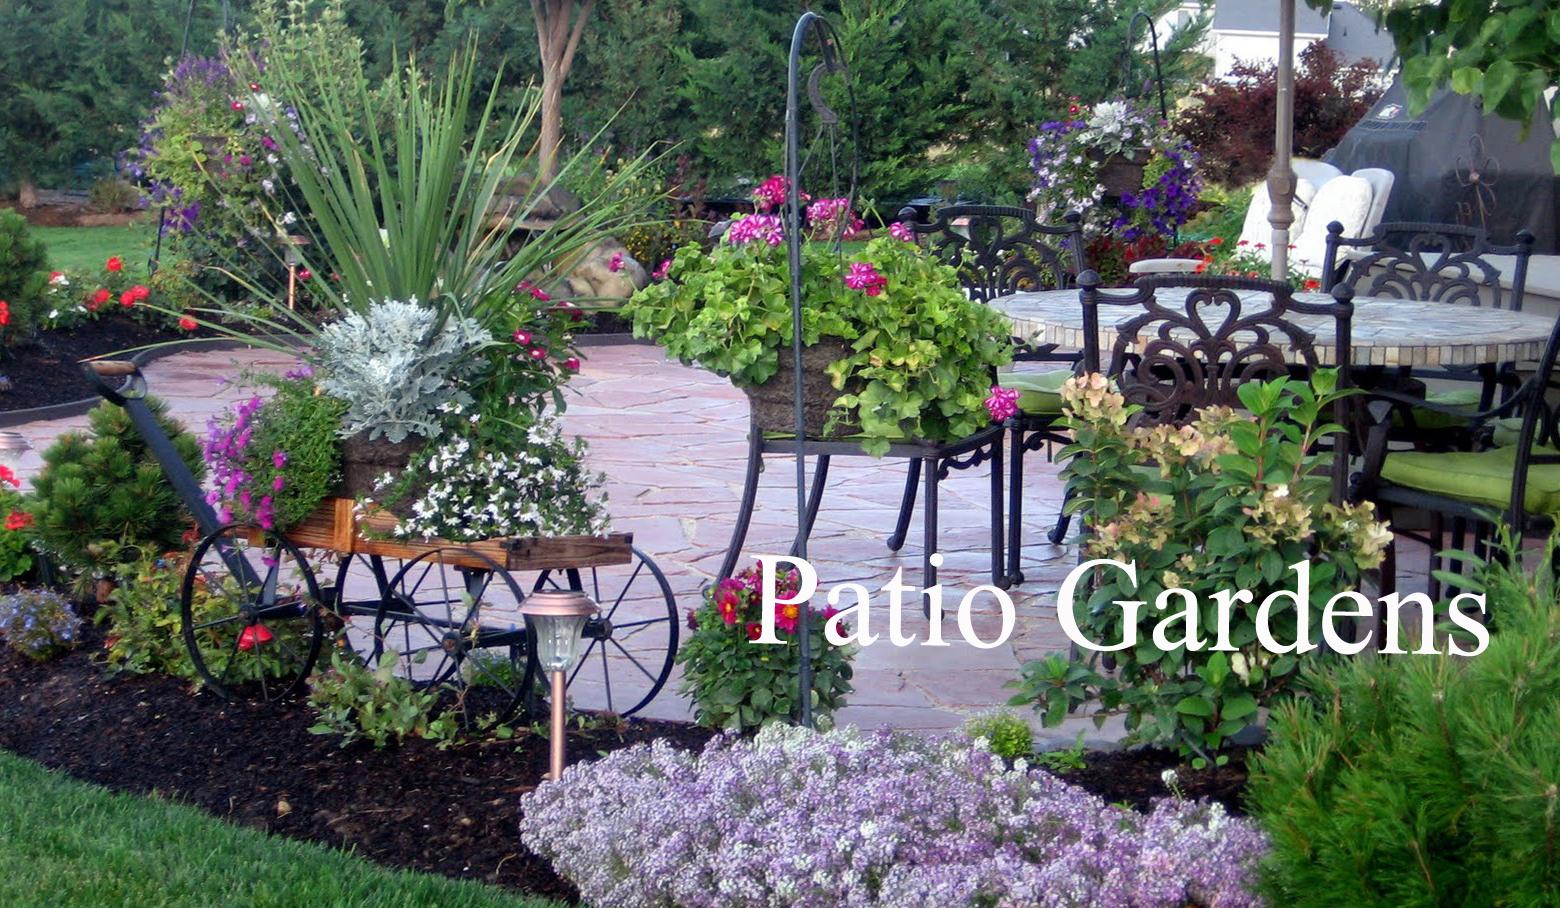 Patio-garden-lanscape-outdoor-containers3.jpg